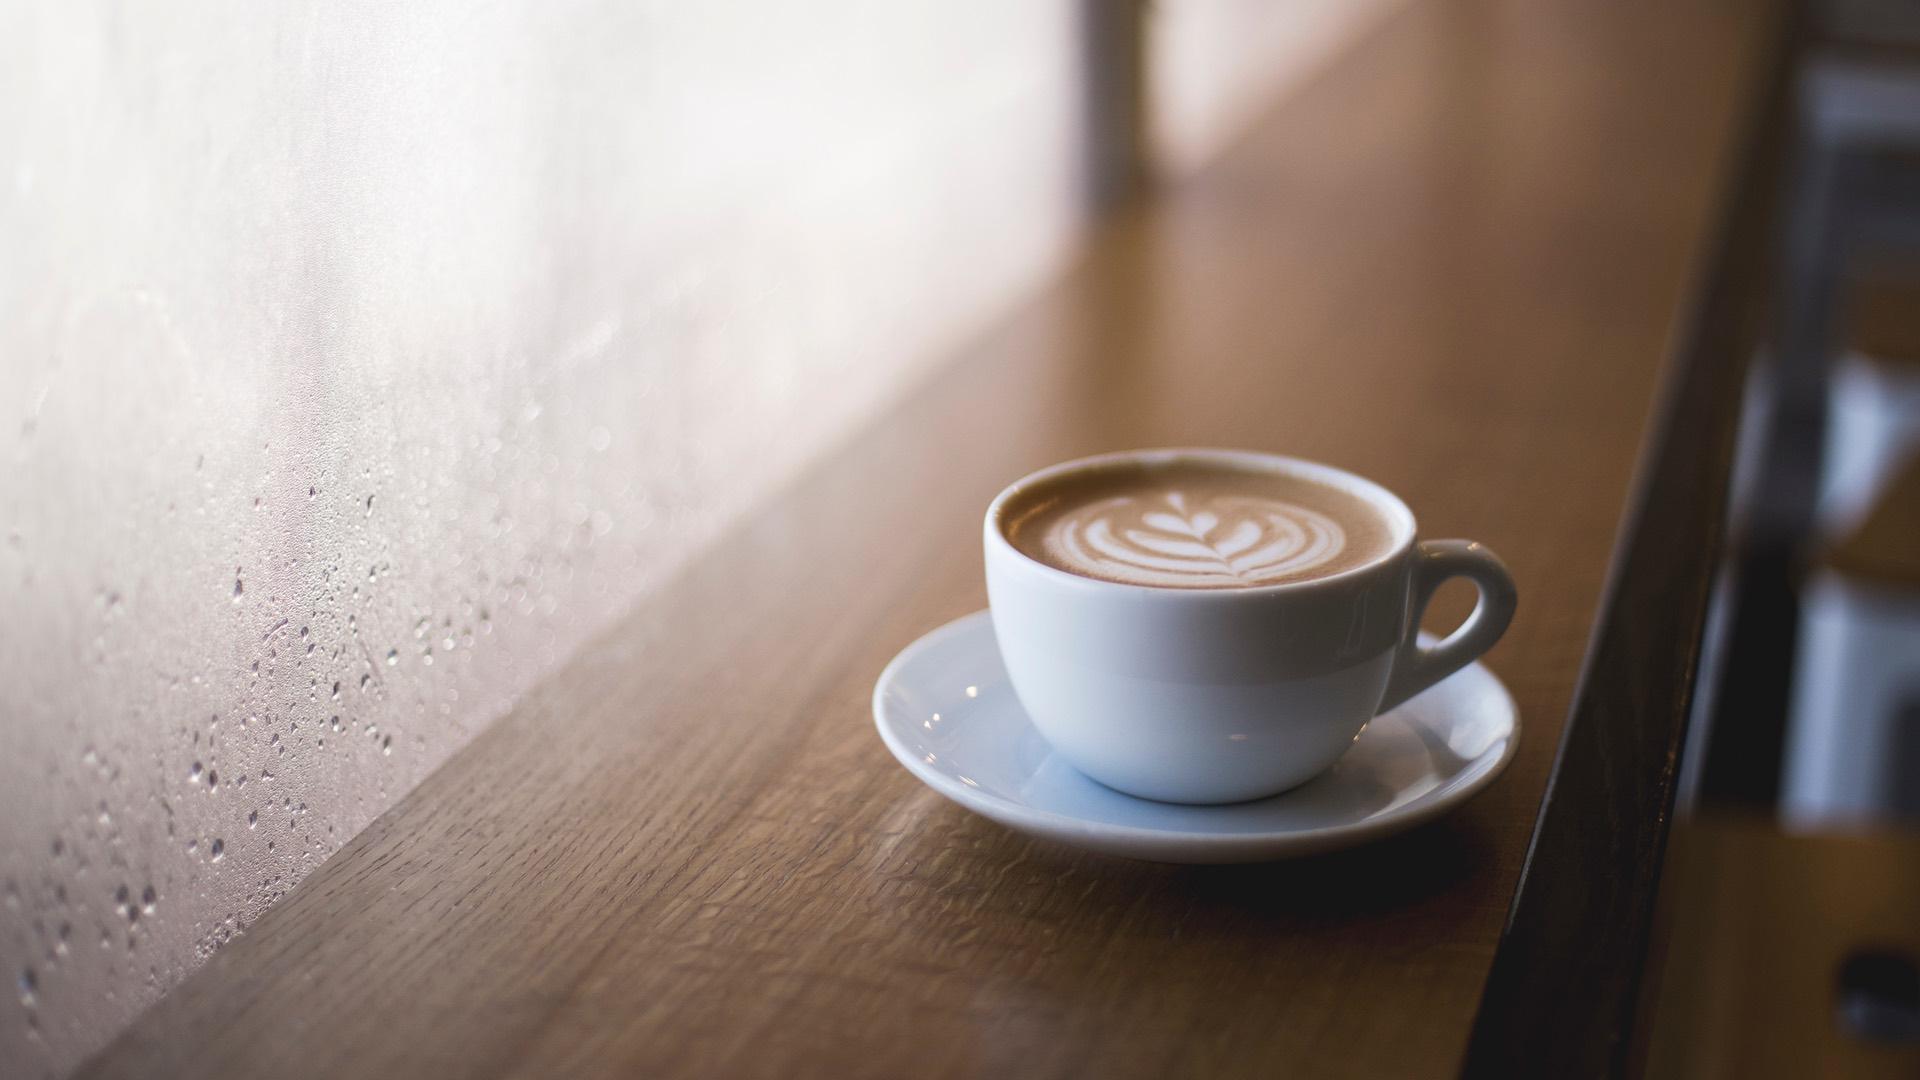 cappuccino cafes coffee rain